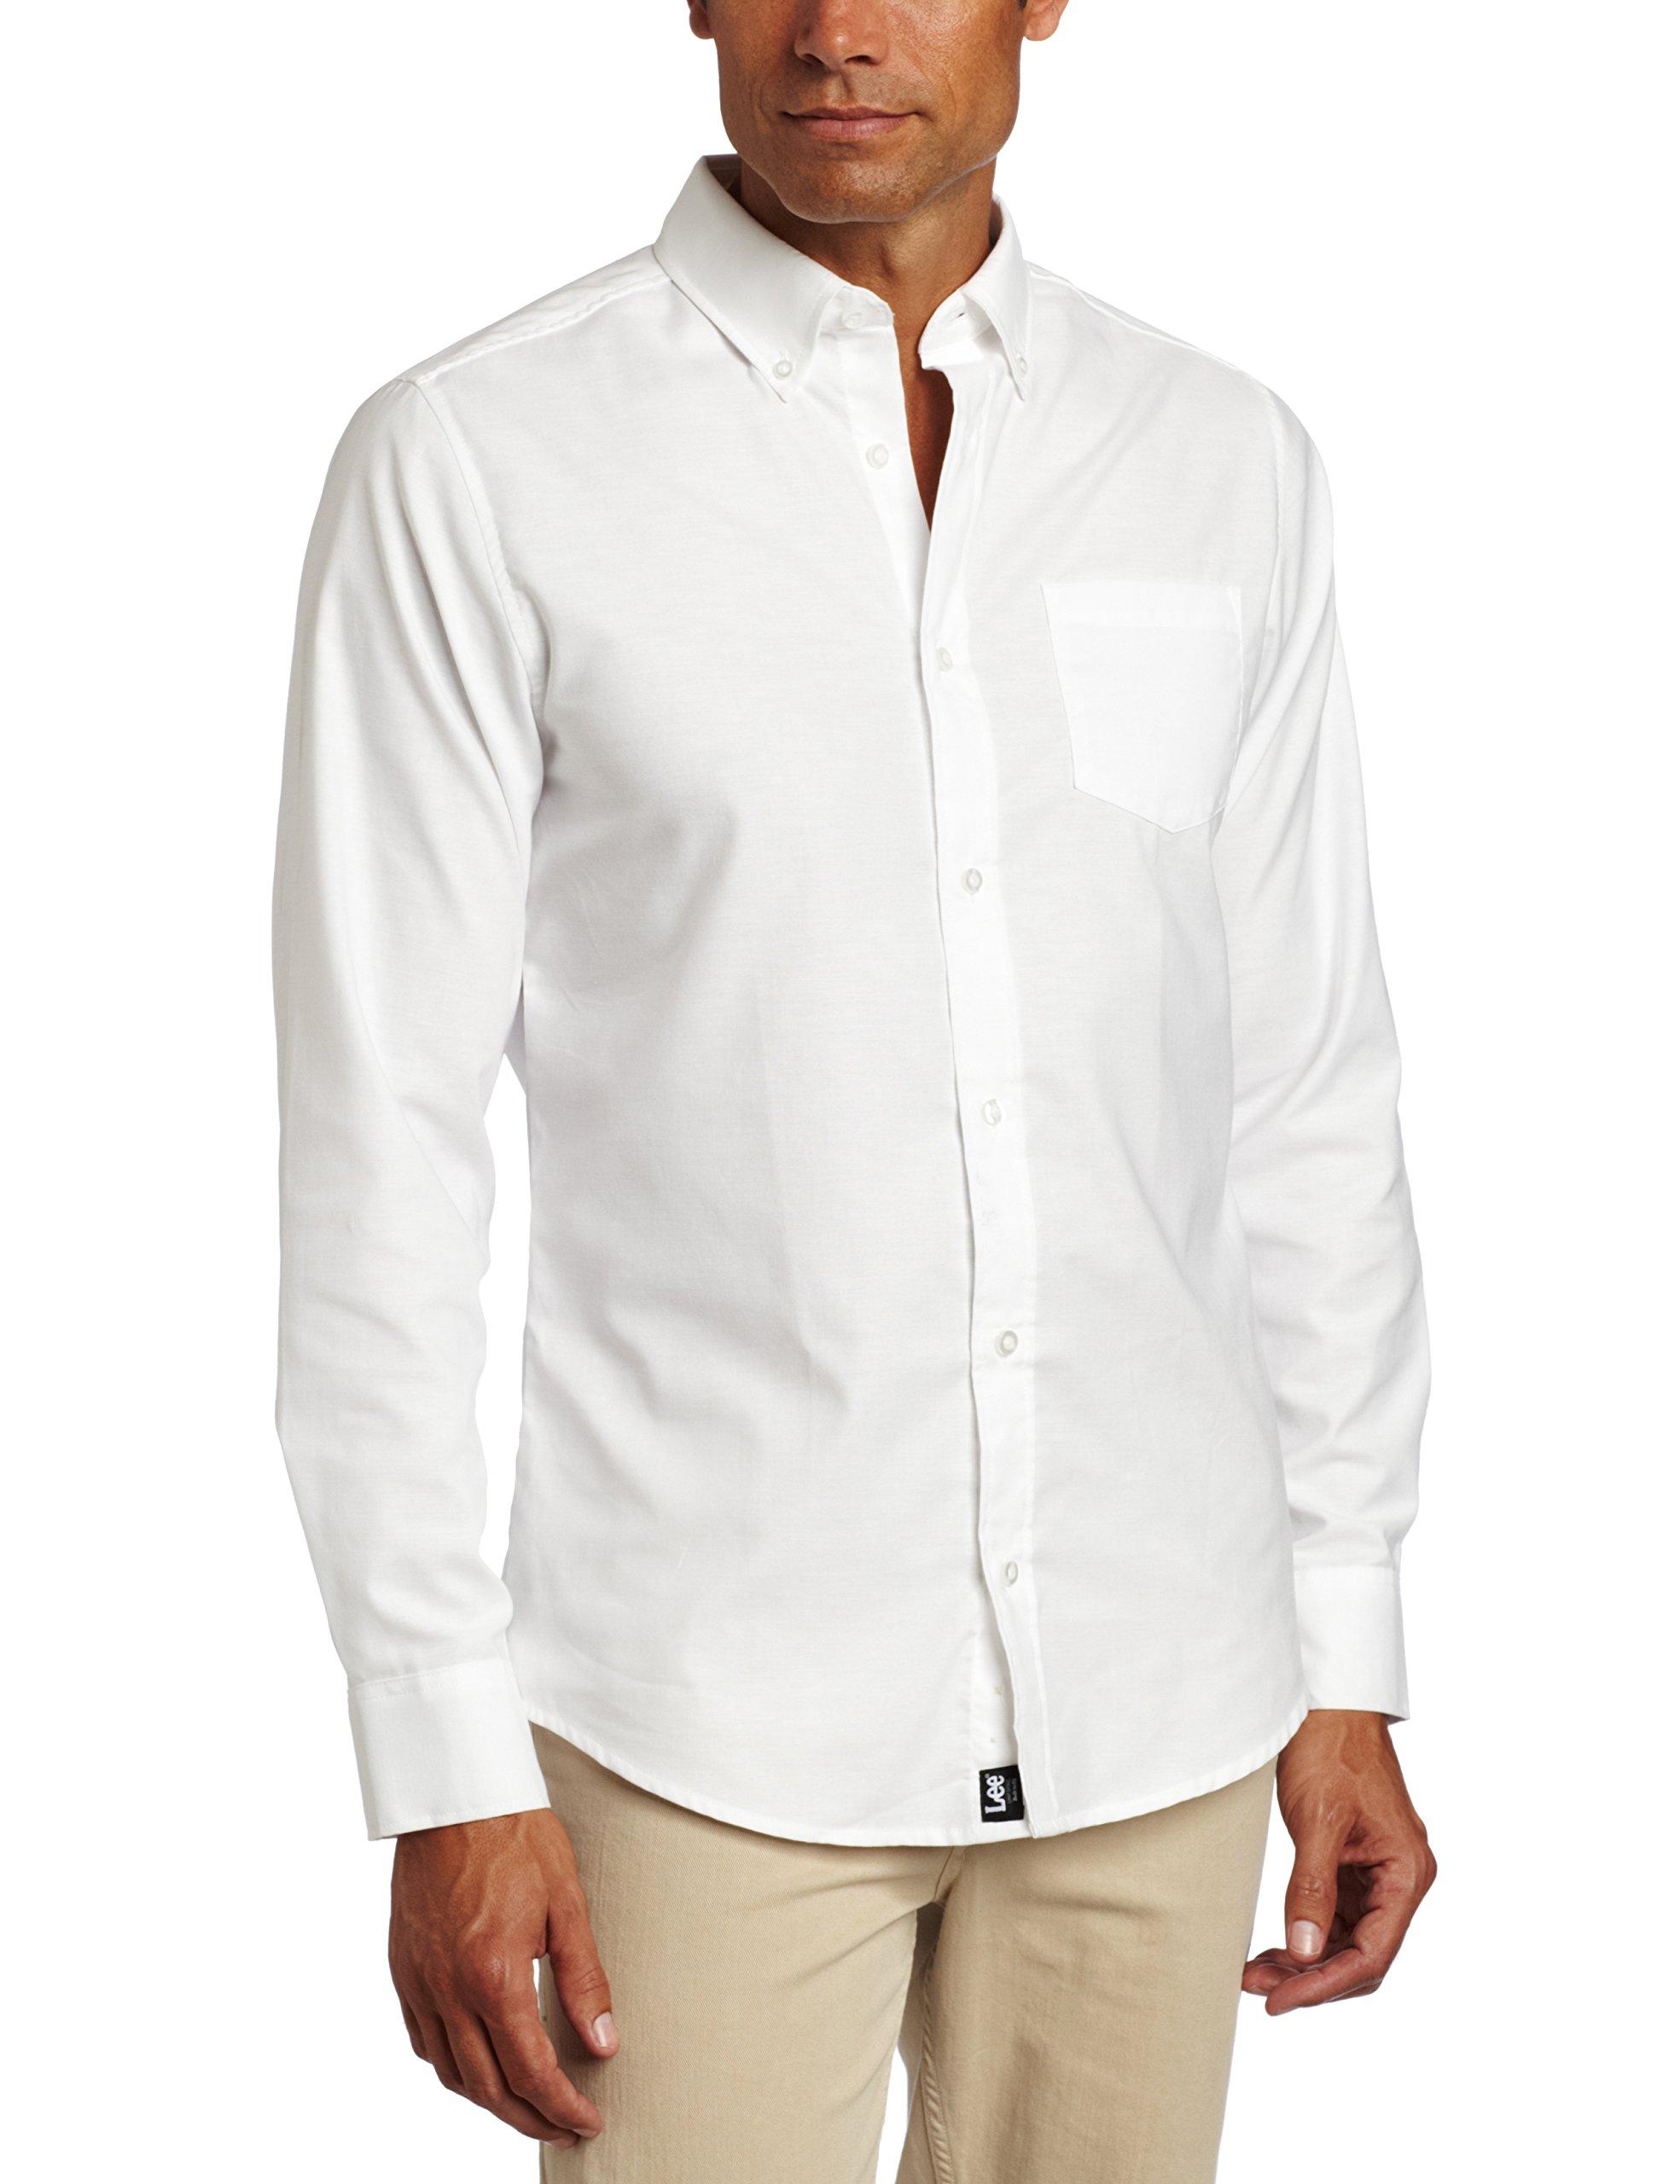 Lee Uniforms Men's Big Long Sleeve Shirt, White, XXX-Large